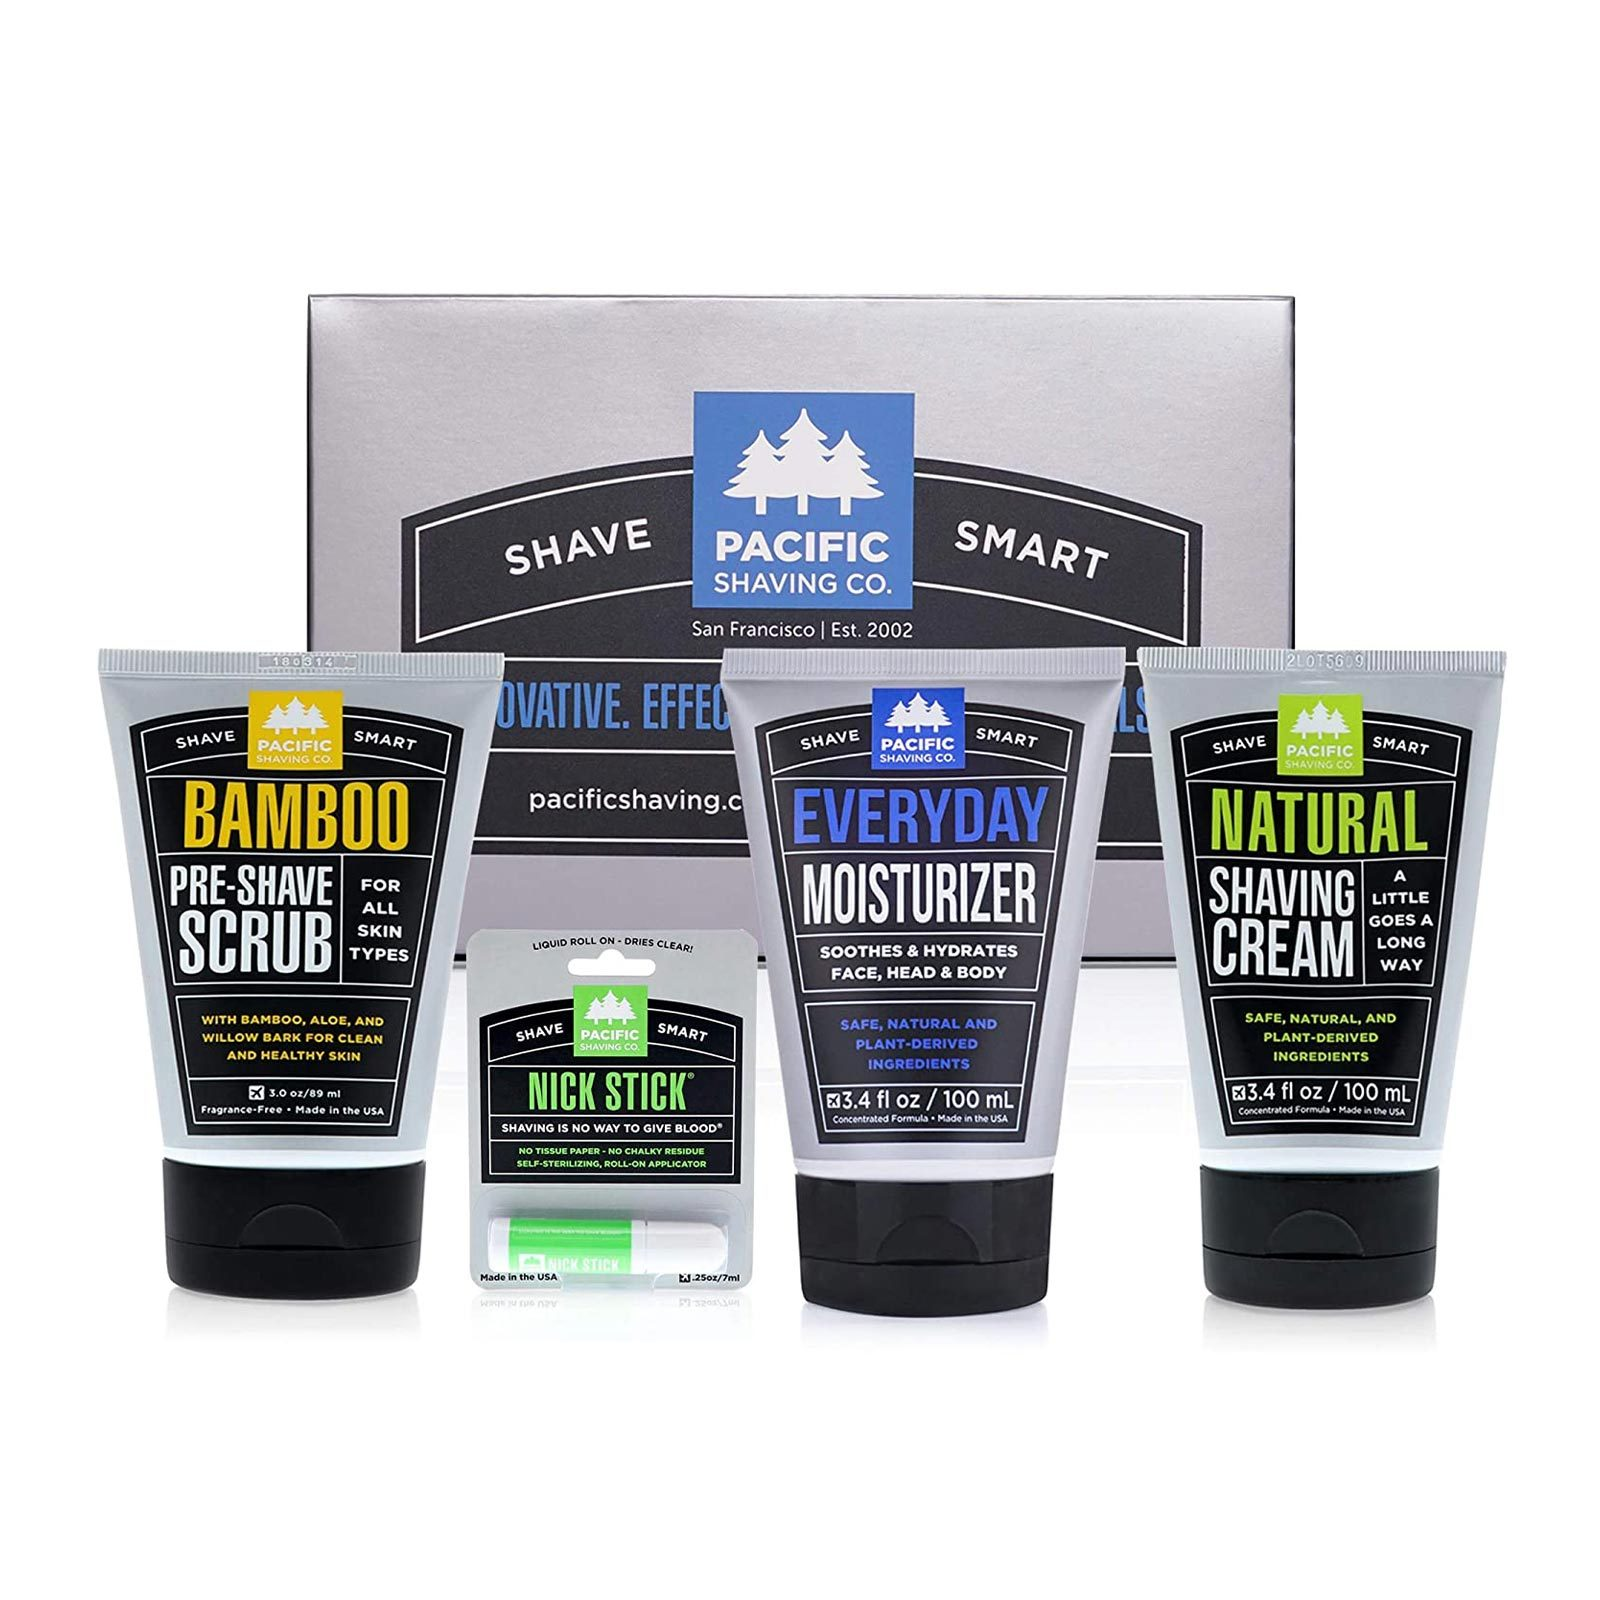 Pacific Shaving Company Shave Regimen Gift Box Set